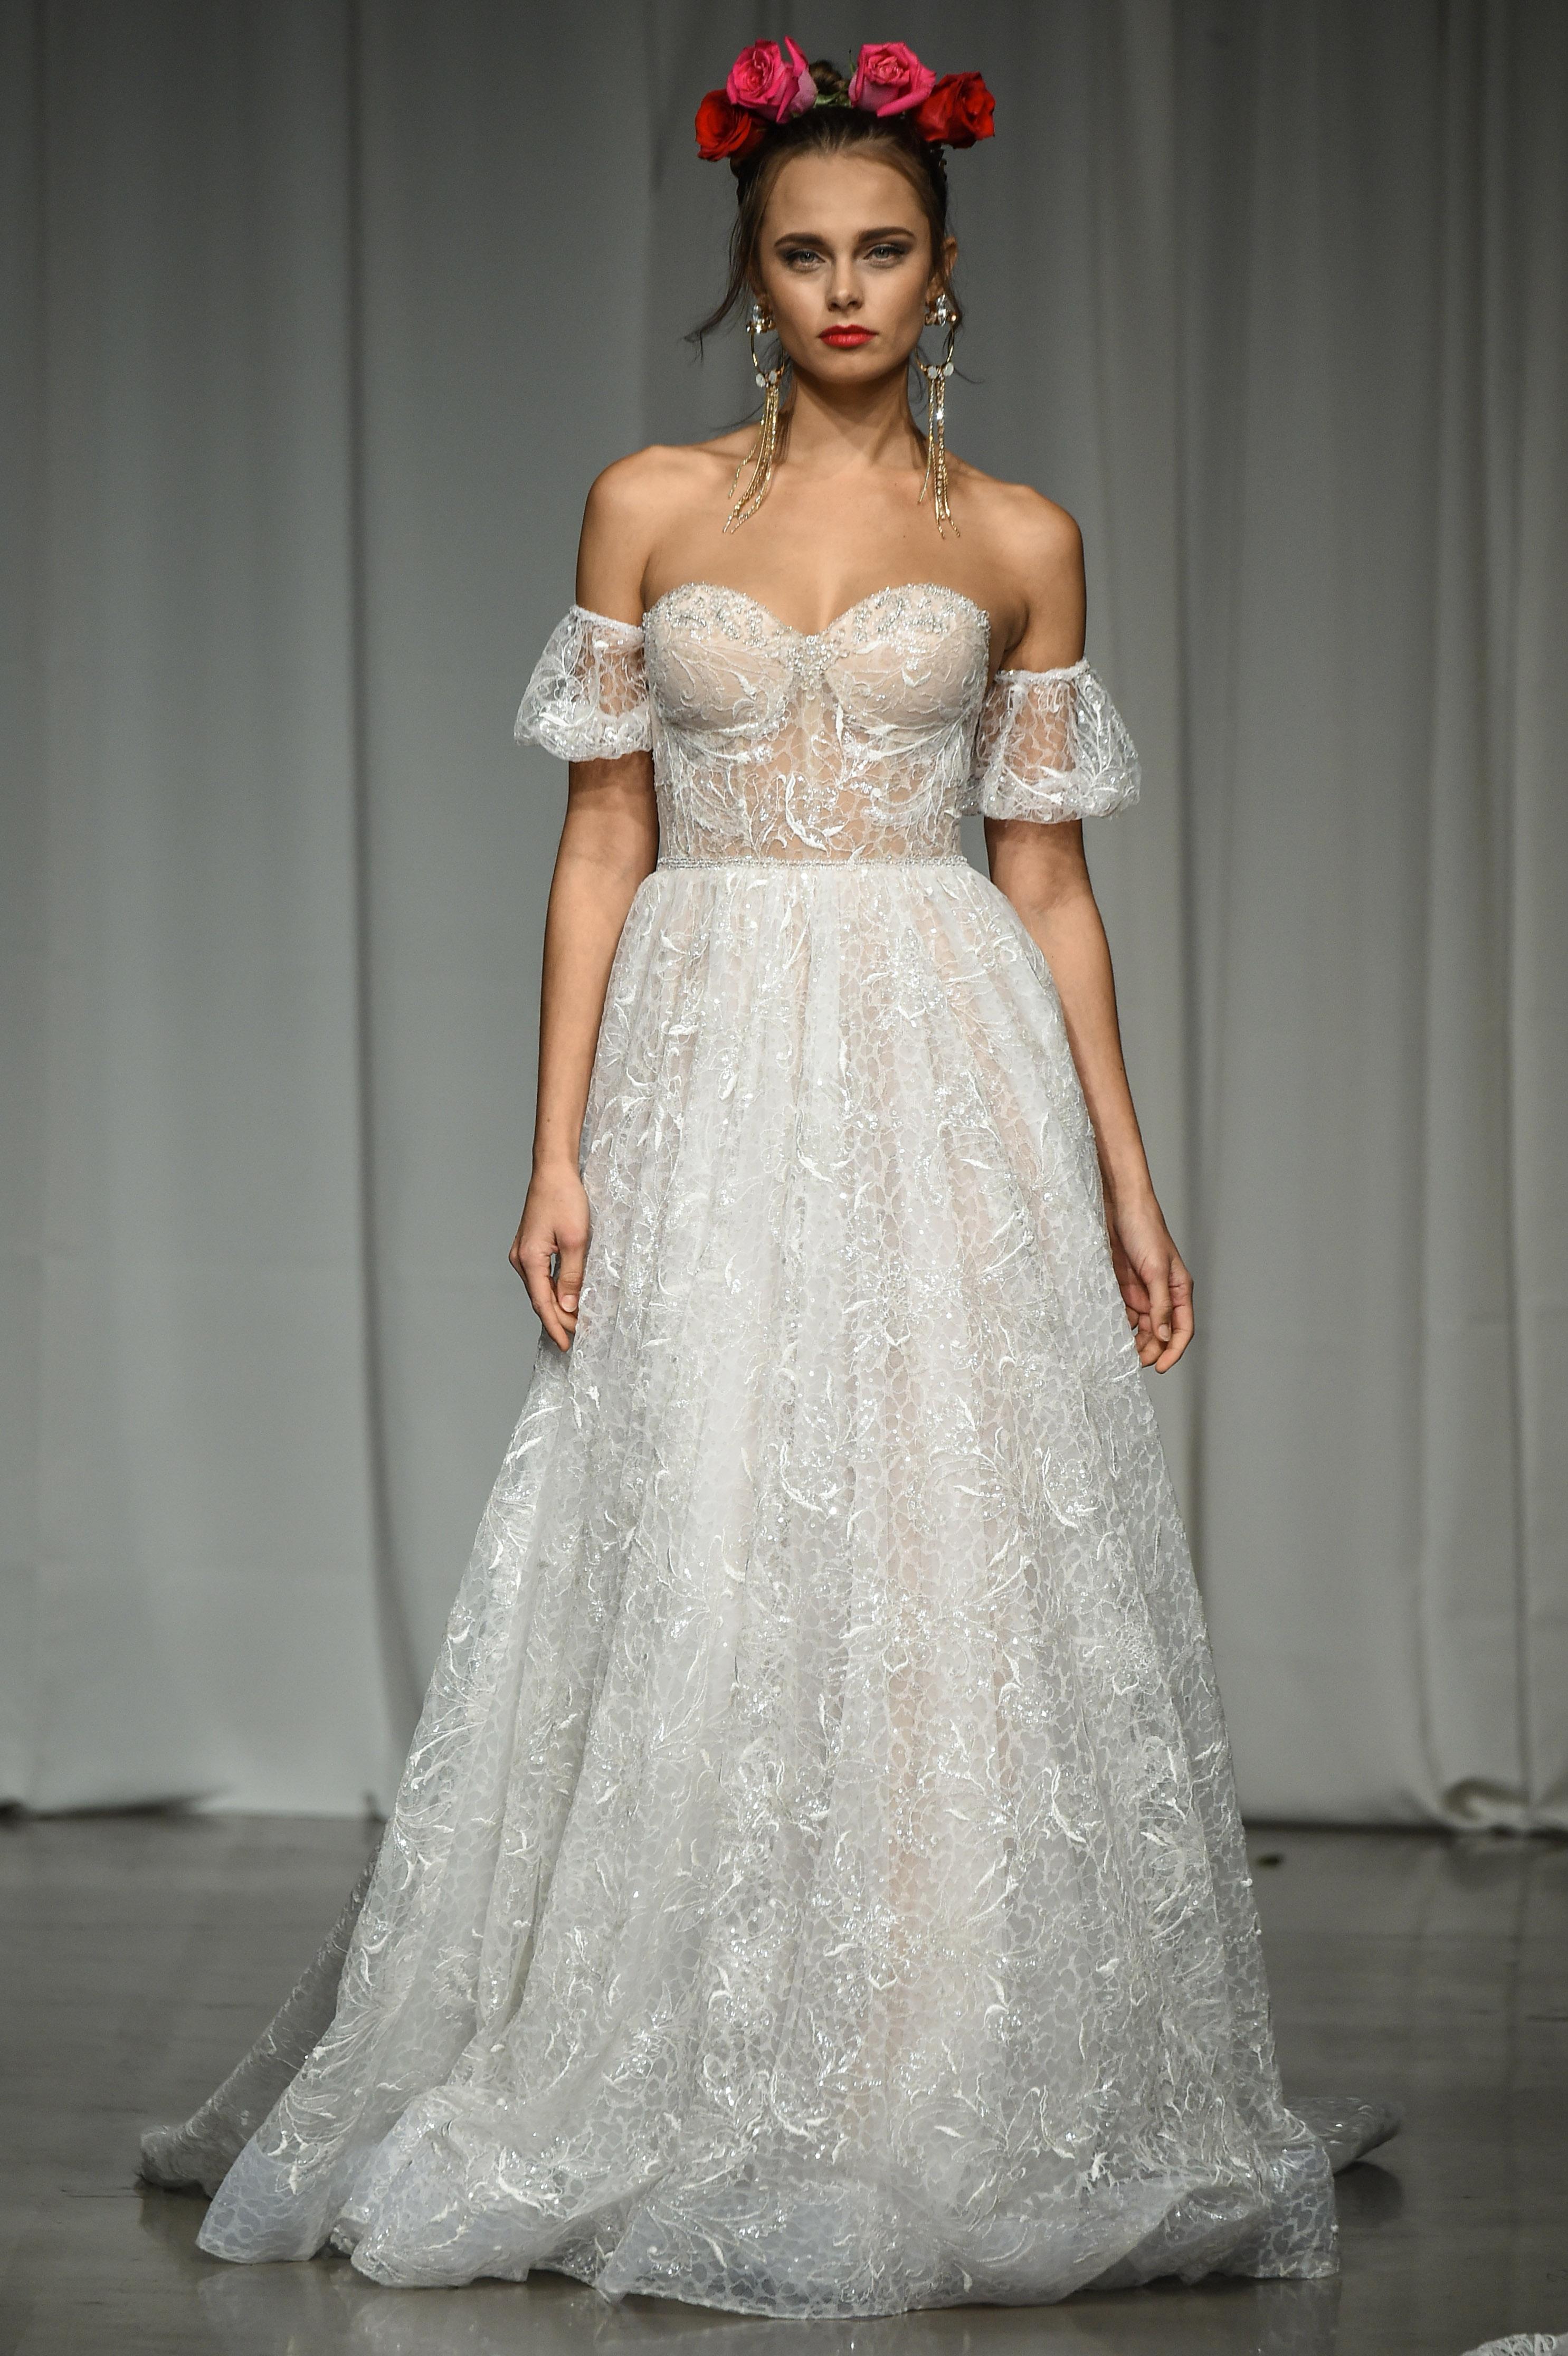 julie vino group fall 2019 over the shoulder corset a-line wedding dress